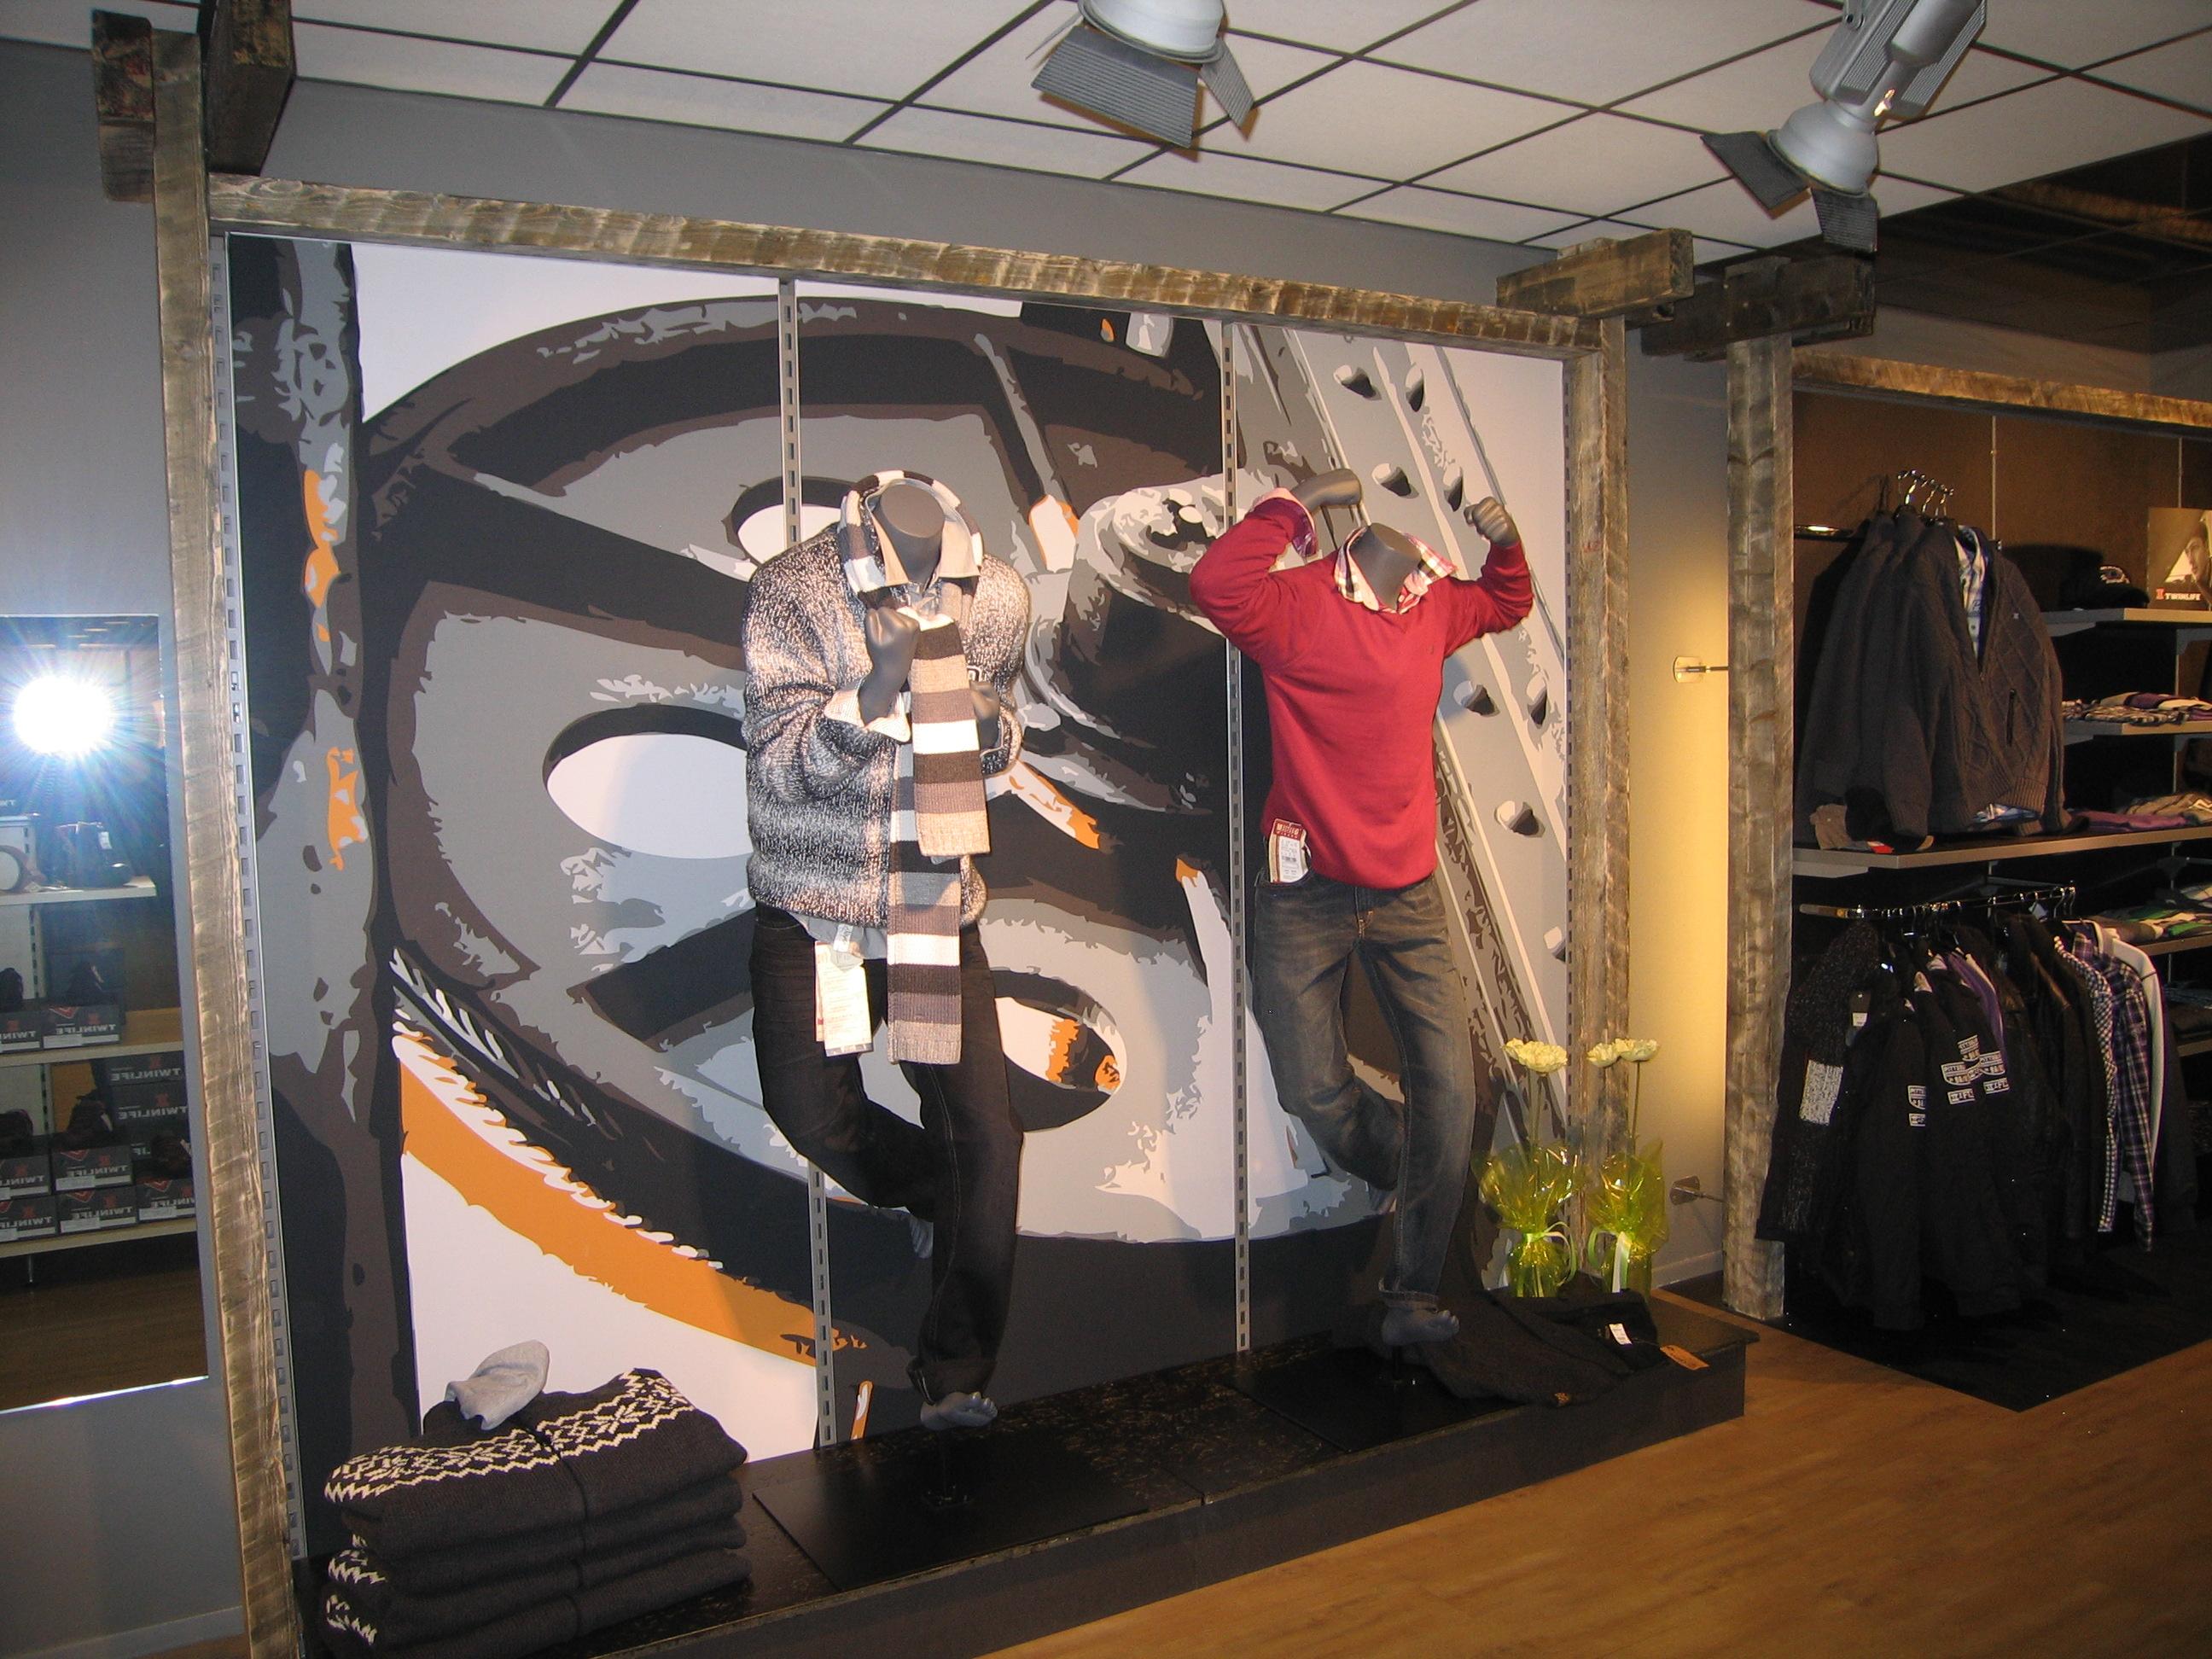 kleding-winkel-franeker